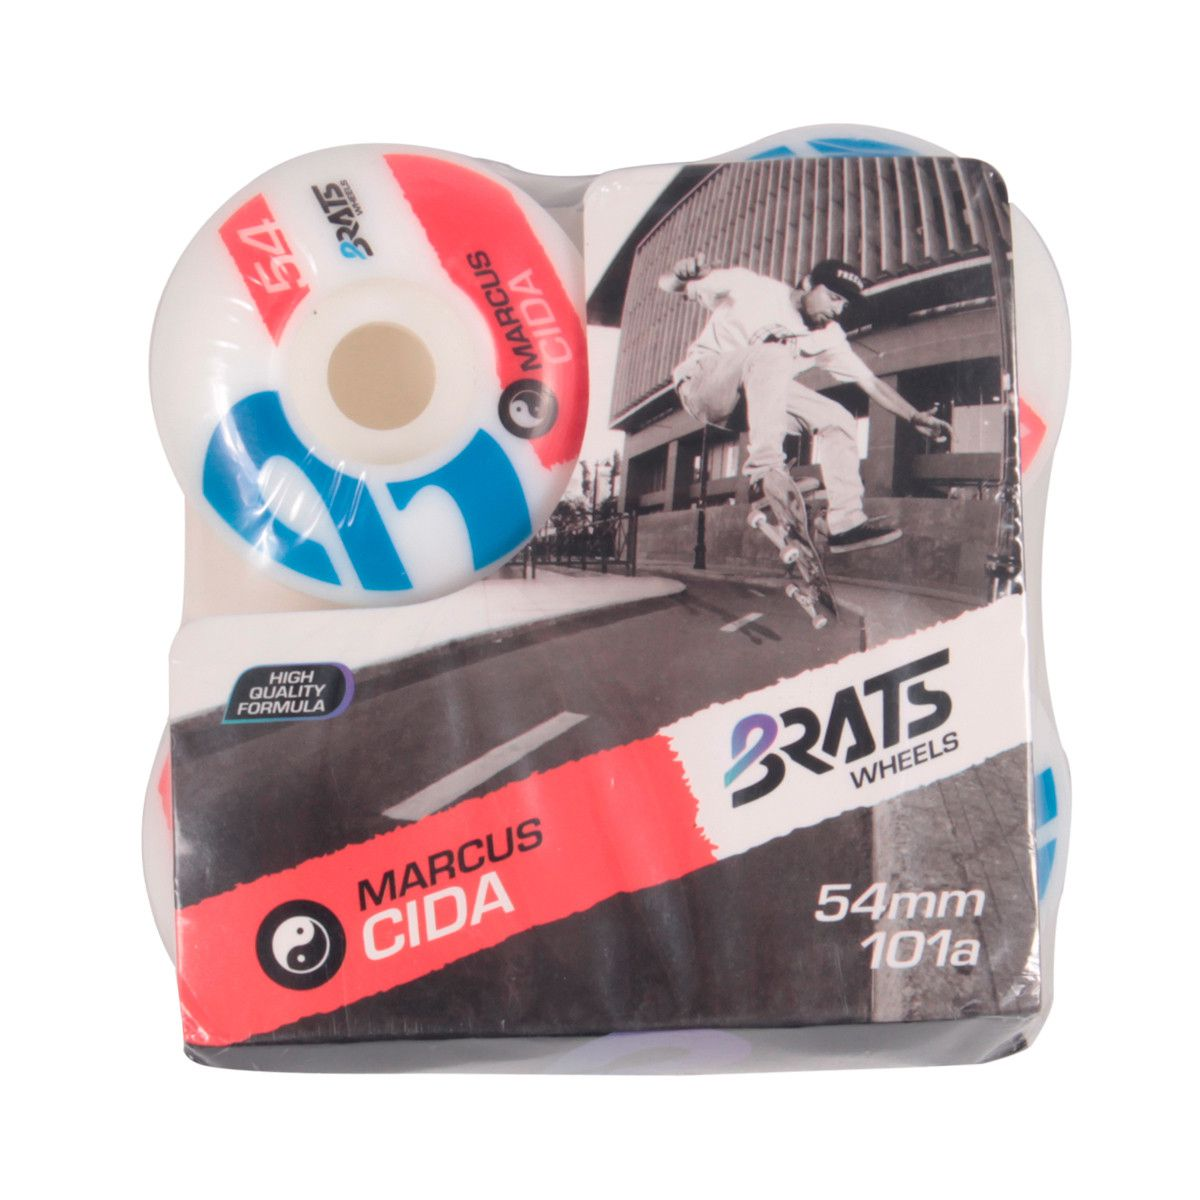 Roda Brats Wheels Marcus Cida 54mm